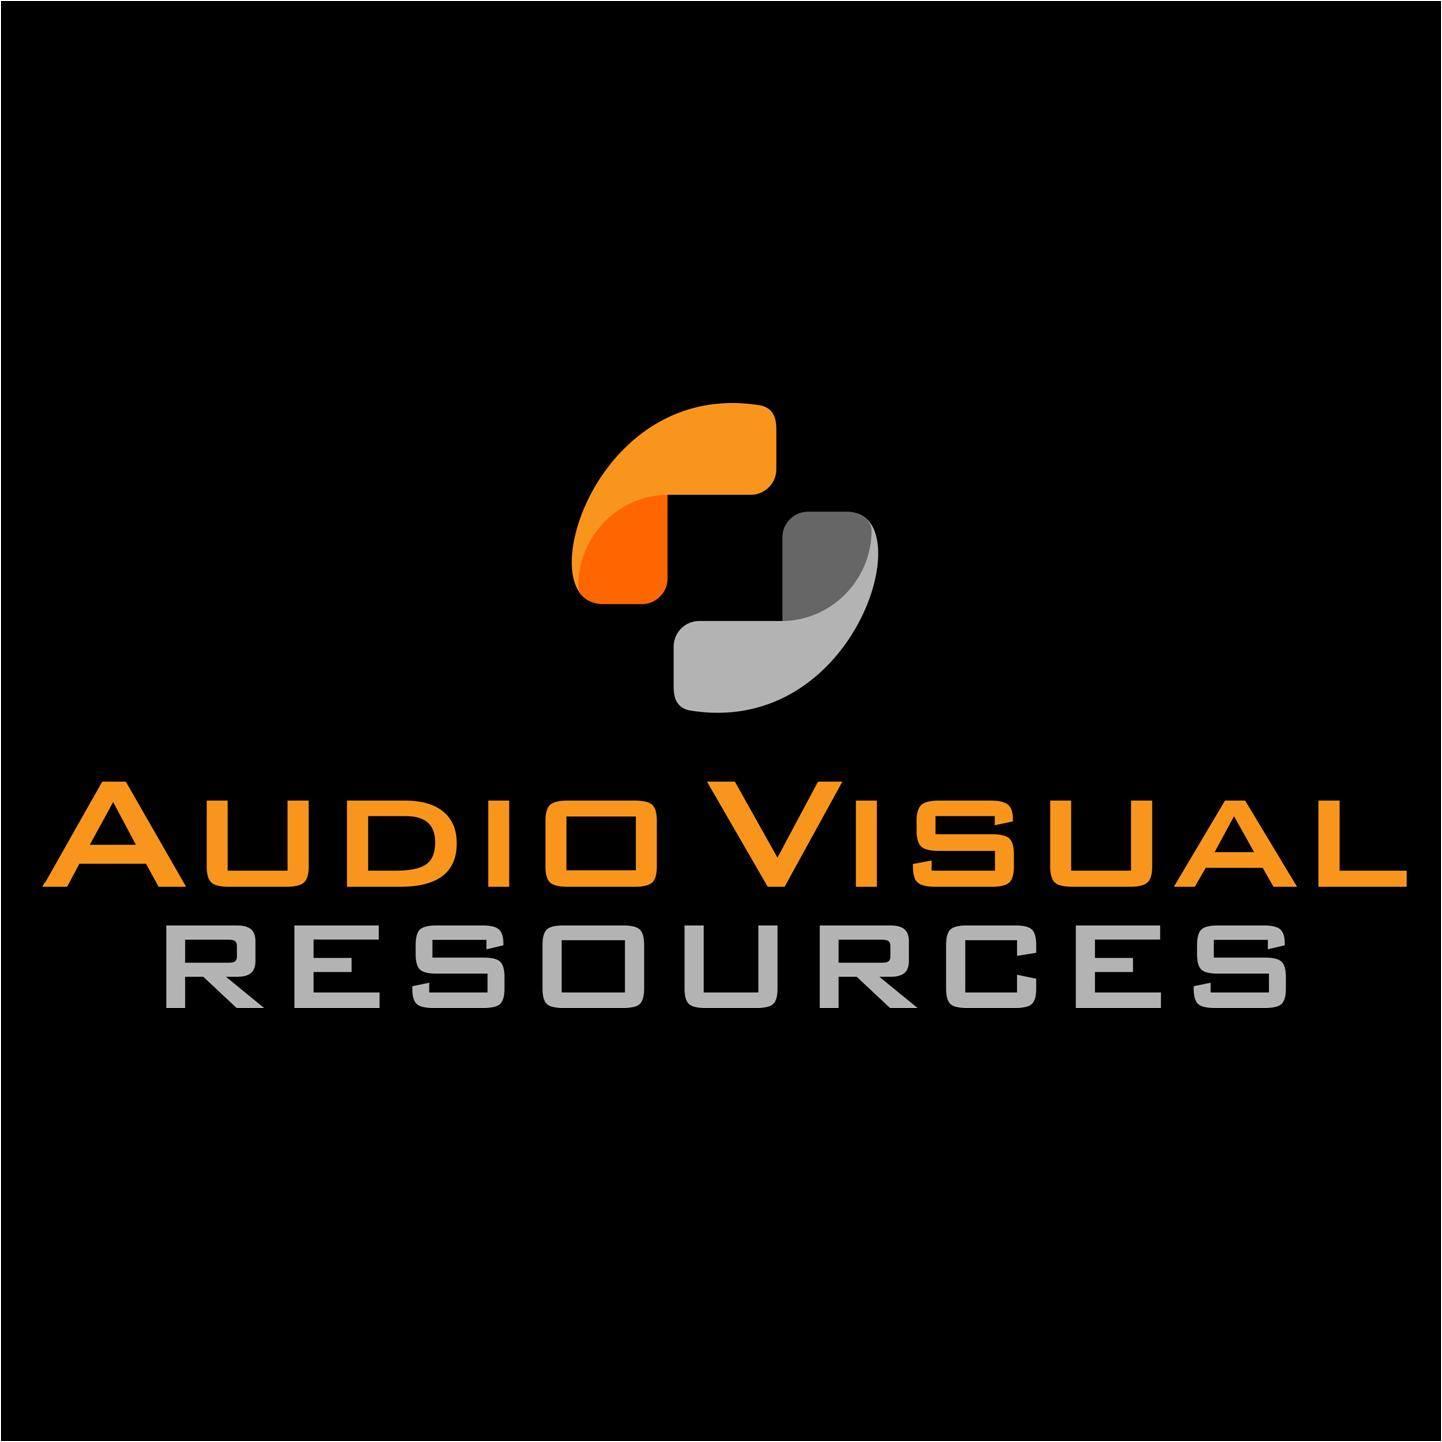 Audio Visual Resources (AVR)